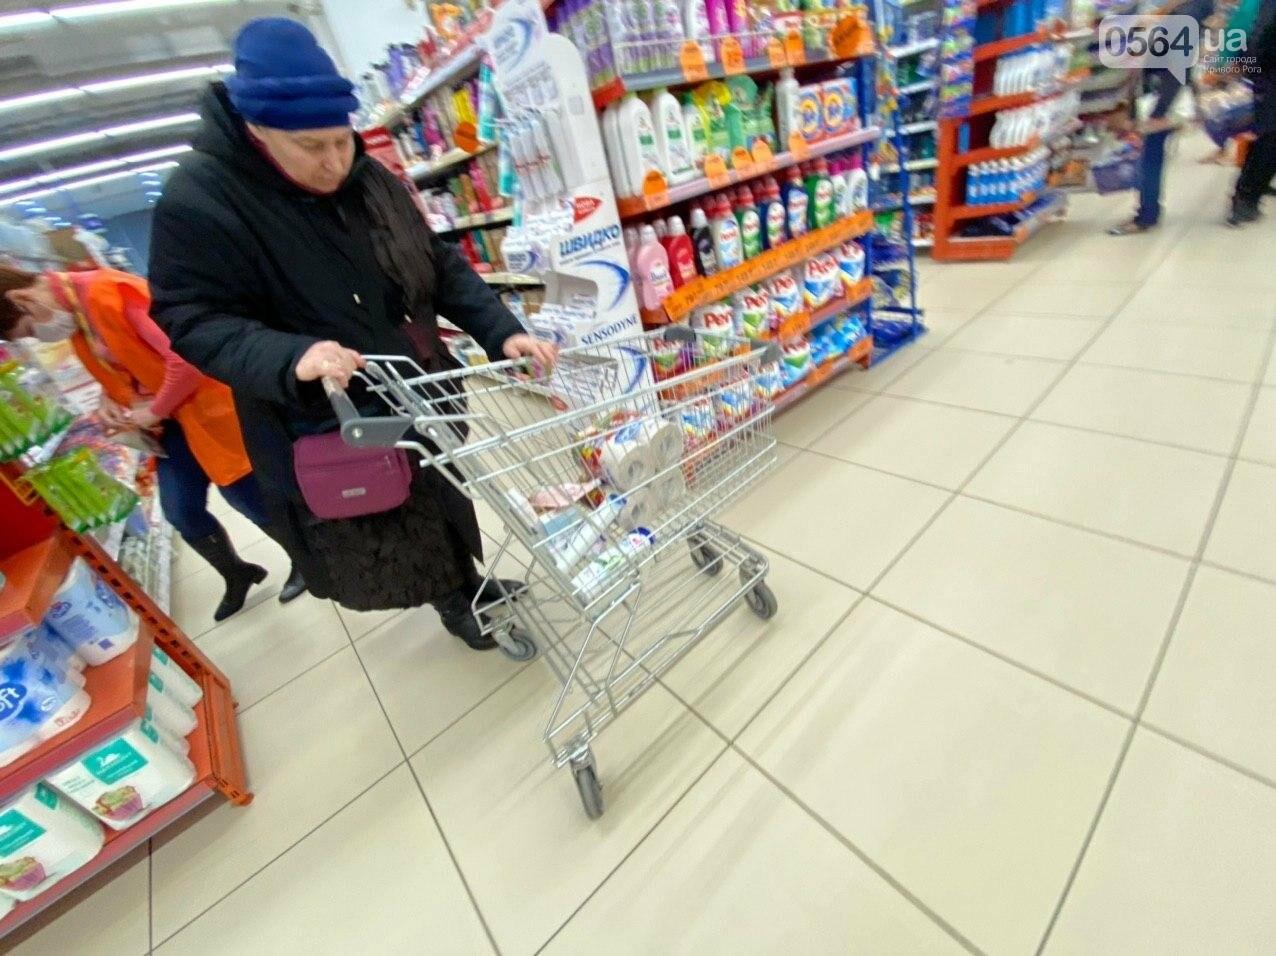 Туалетная бумага и гречка: что скупают криворожане во время карантина, - ФОТО , фото-17